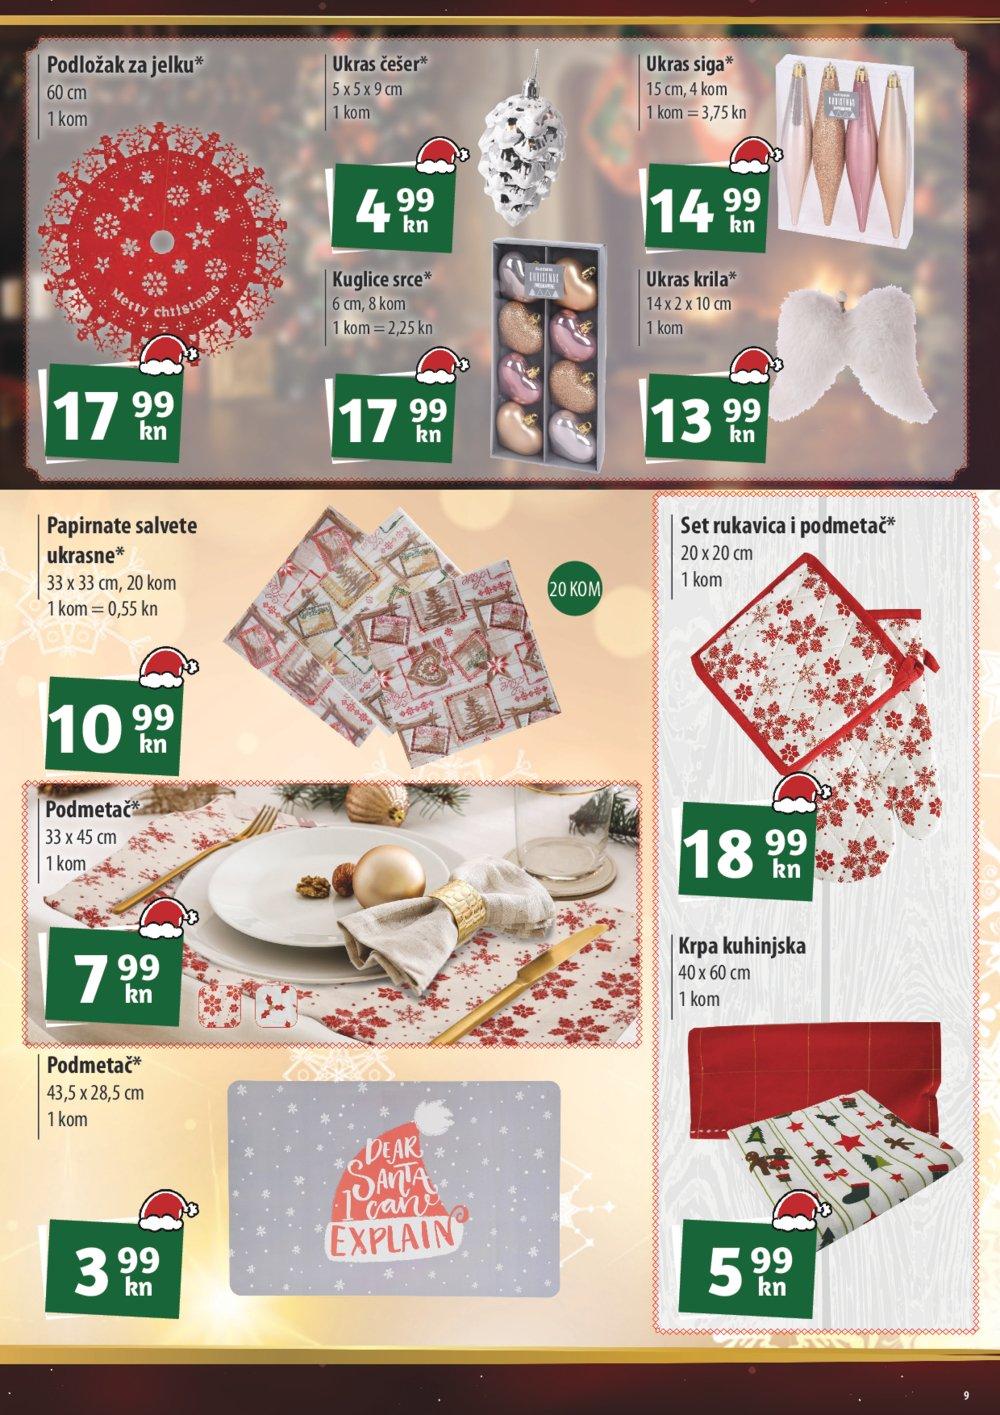 Boso NTL Maxi katalog Akcija 05.12.-11.12.2019.